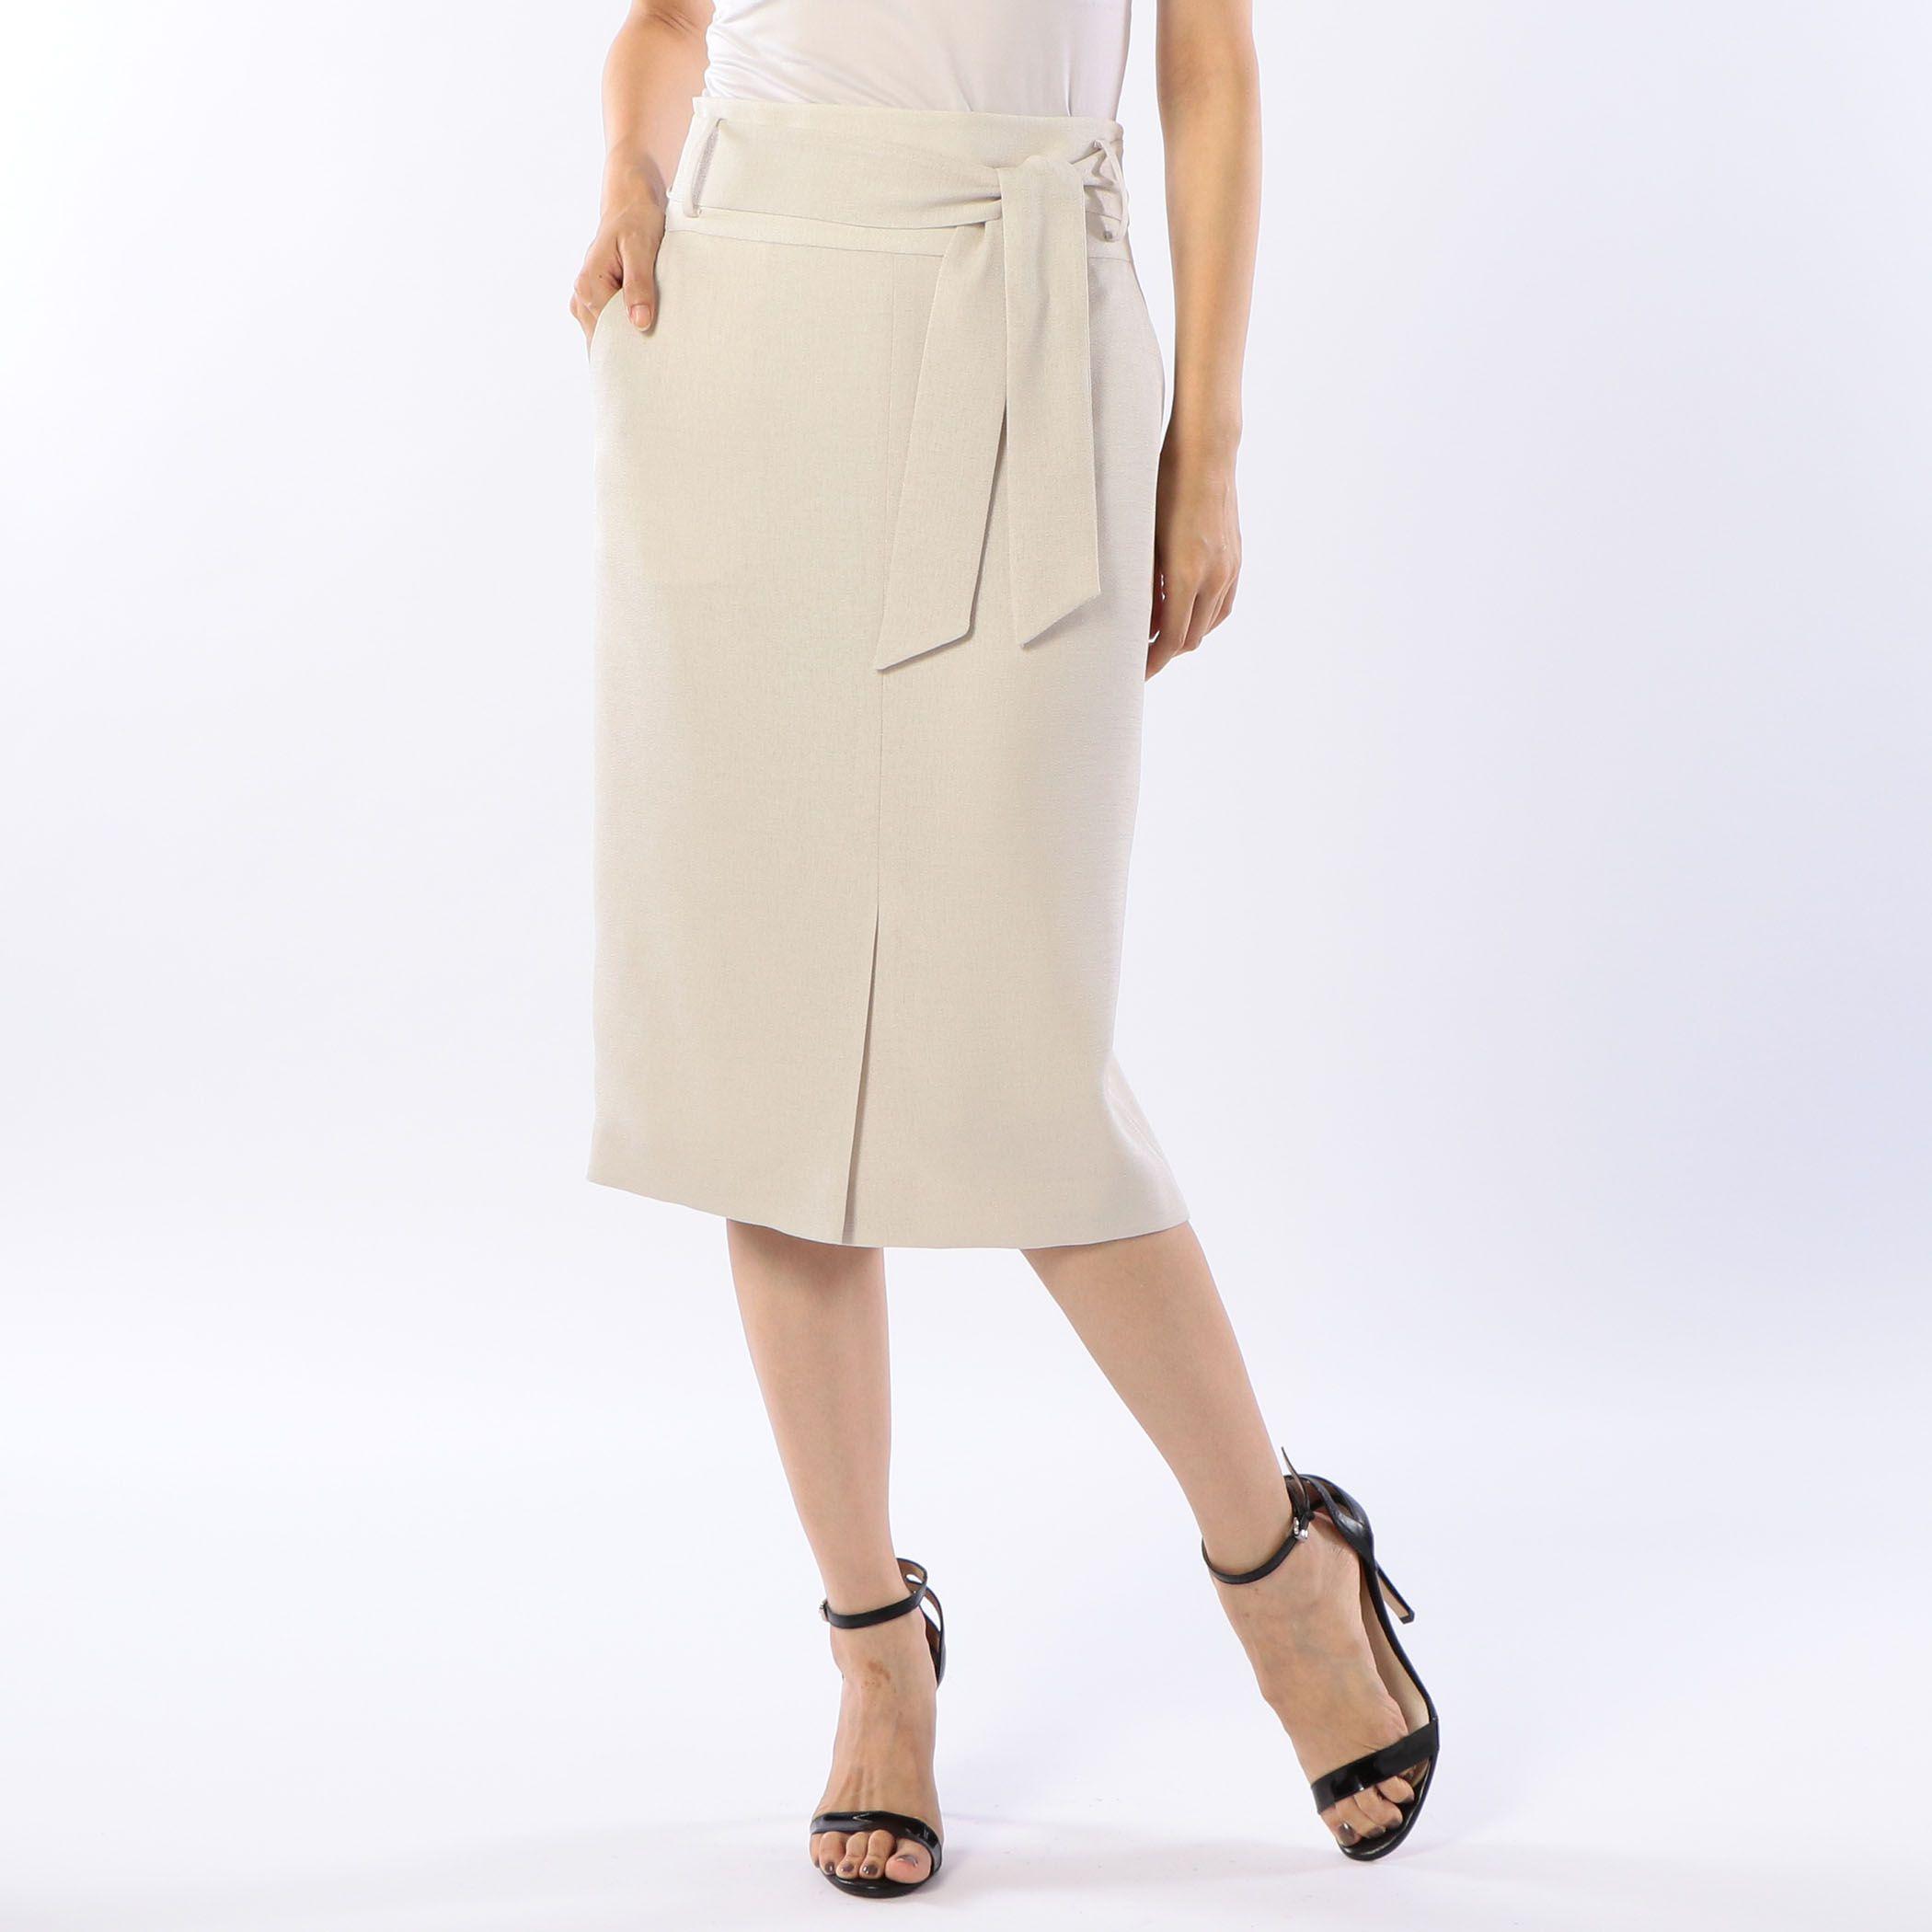 NOLLEY'Ssophiノーリーズソフィー/麻調ツイルタイトスカート